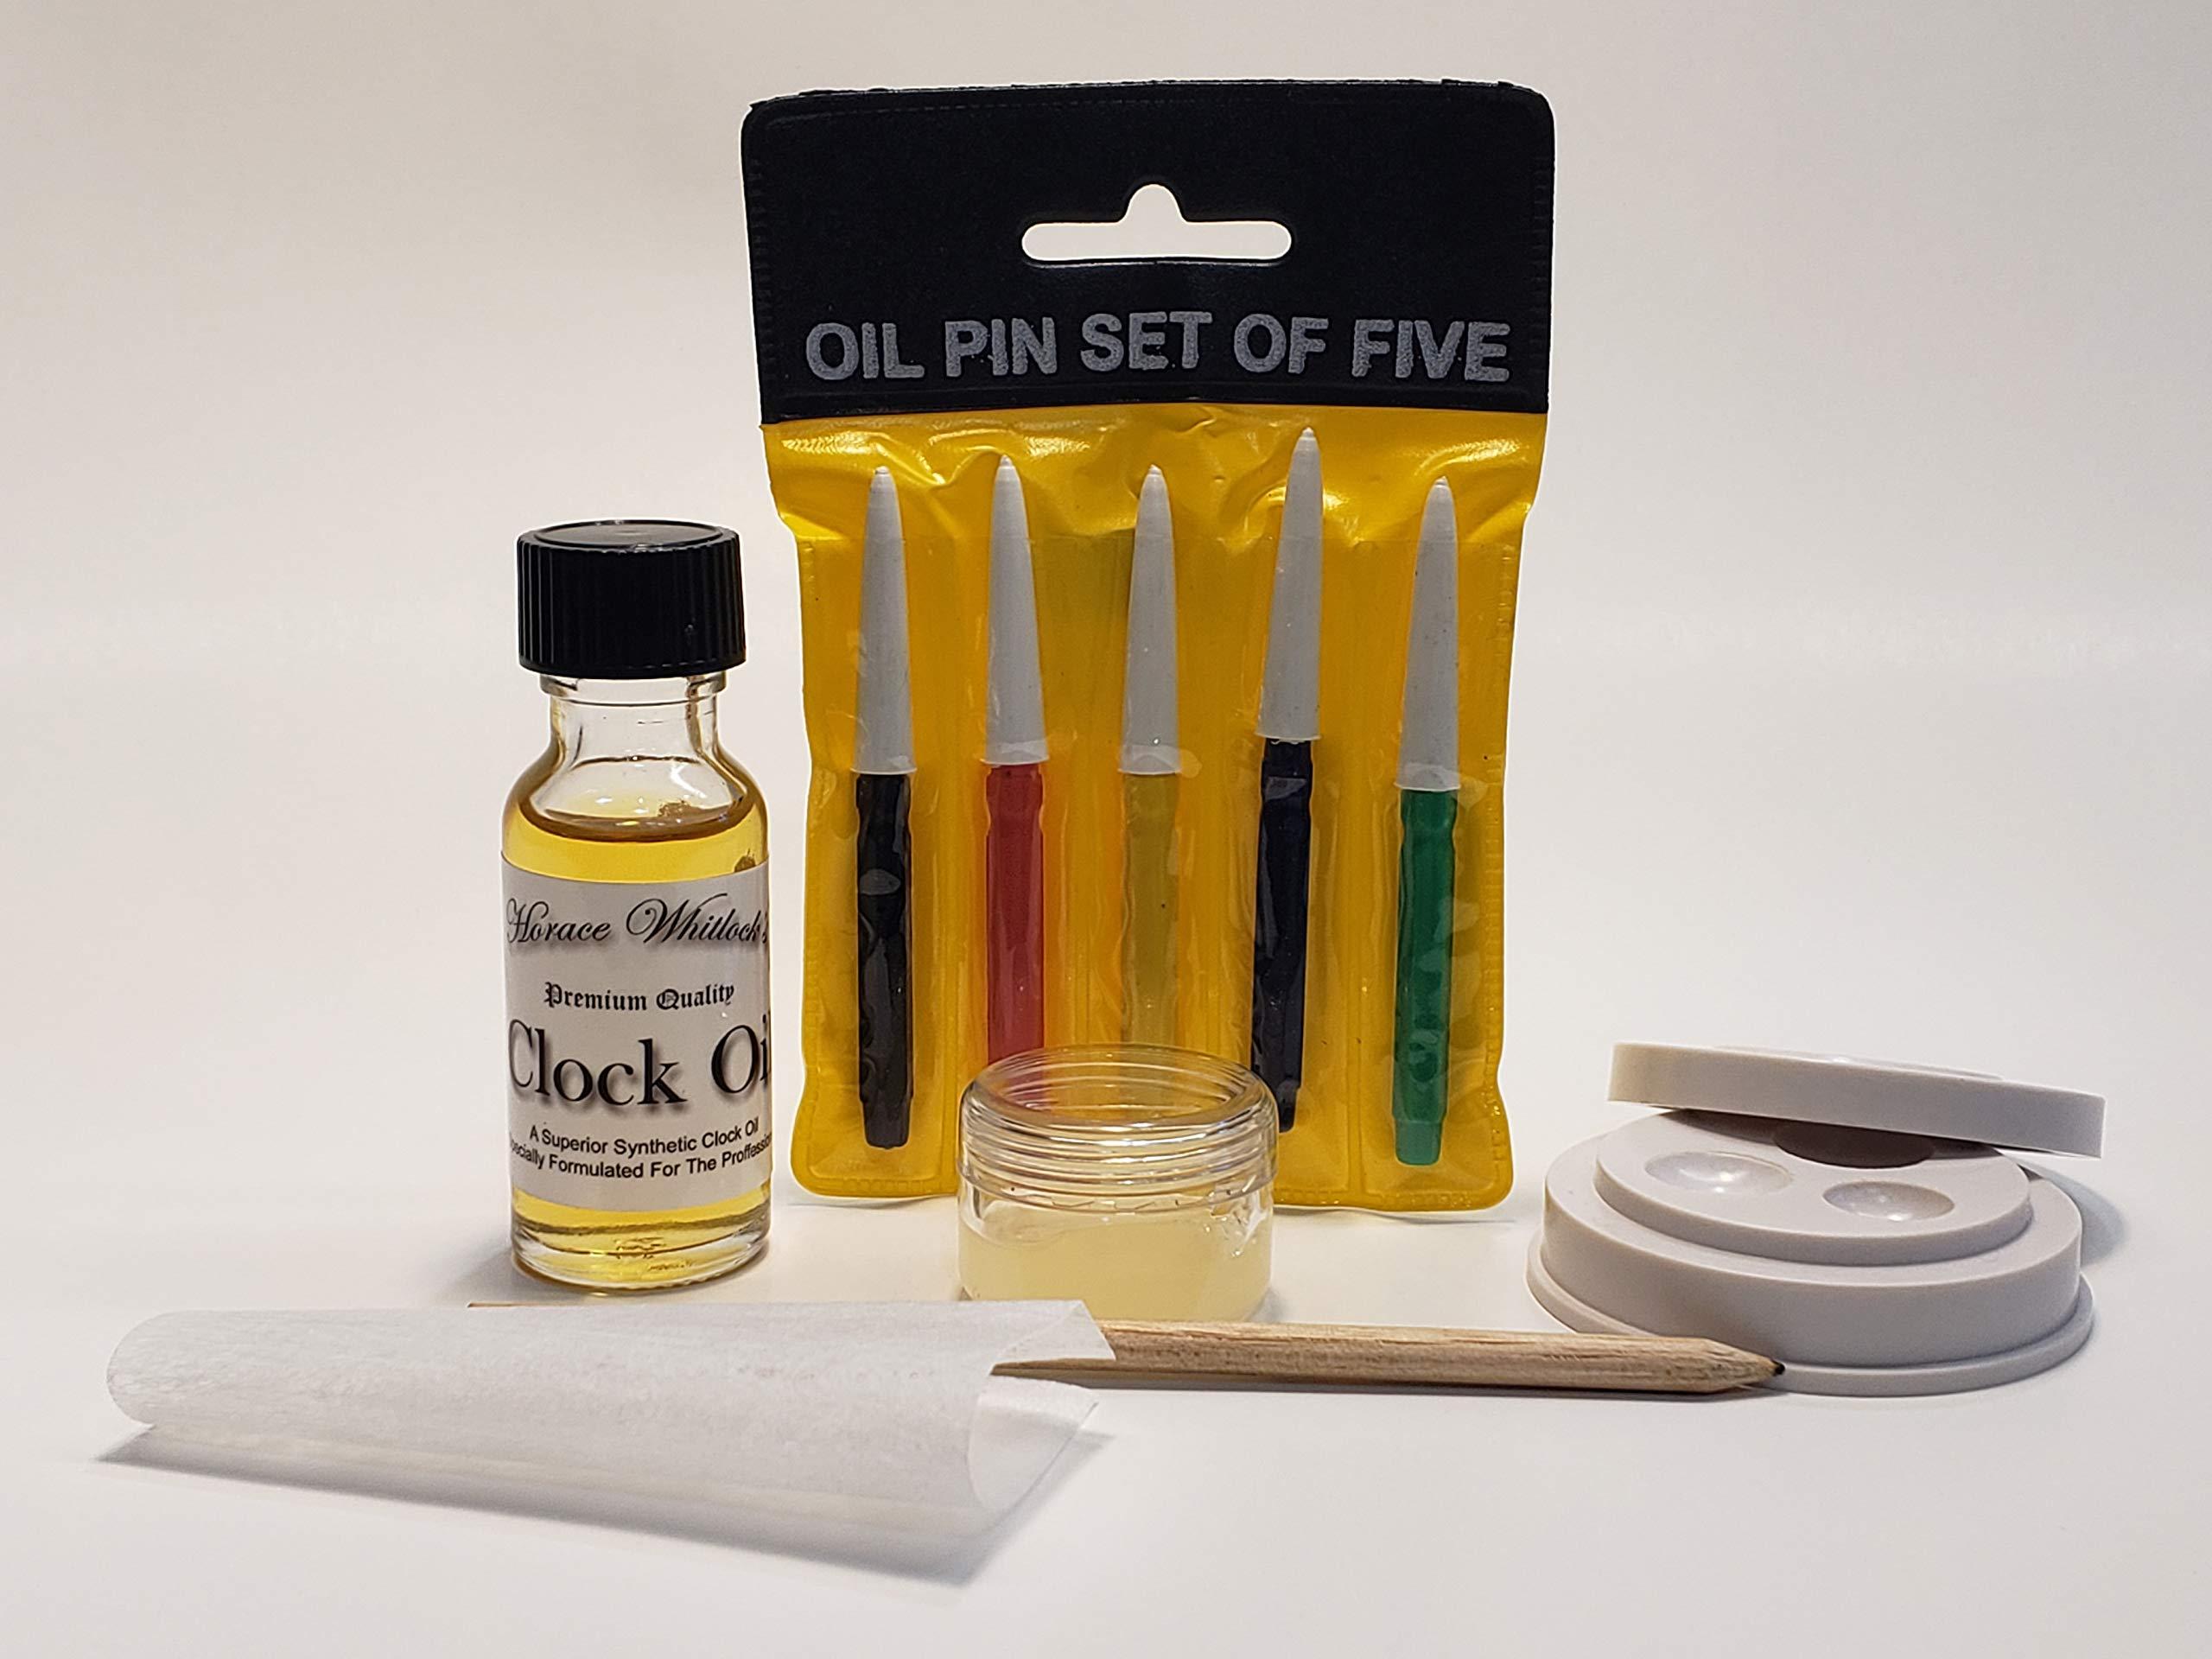 Horace Whitlock Synthetic Clock Oil KIt (10 Piece Kit)